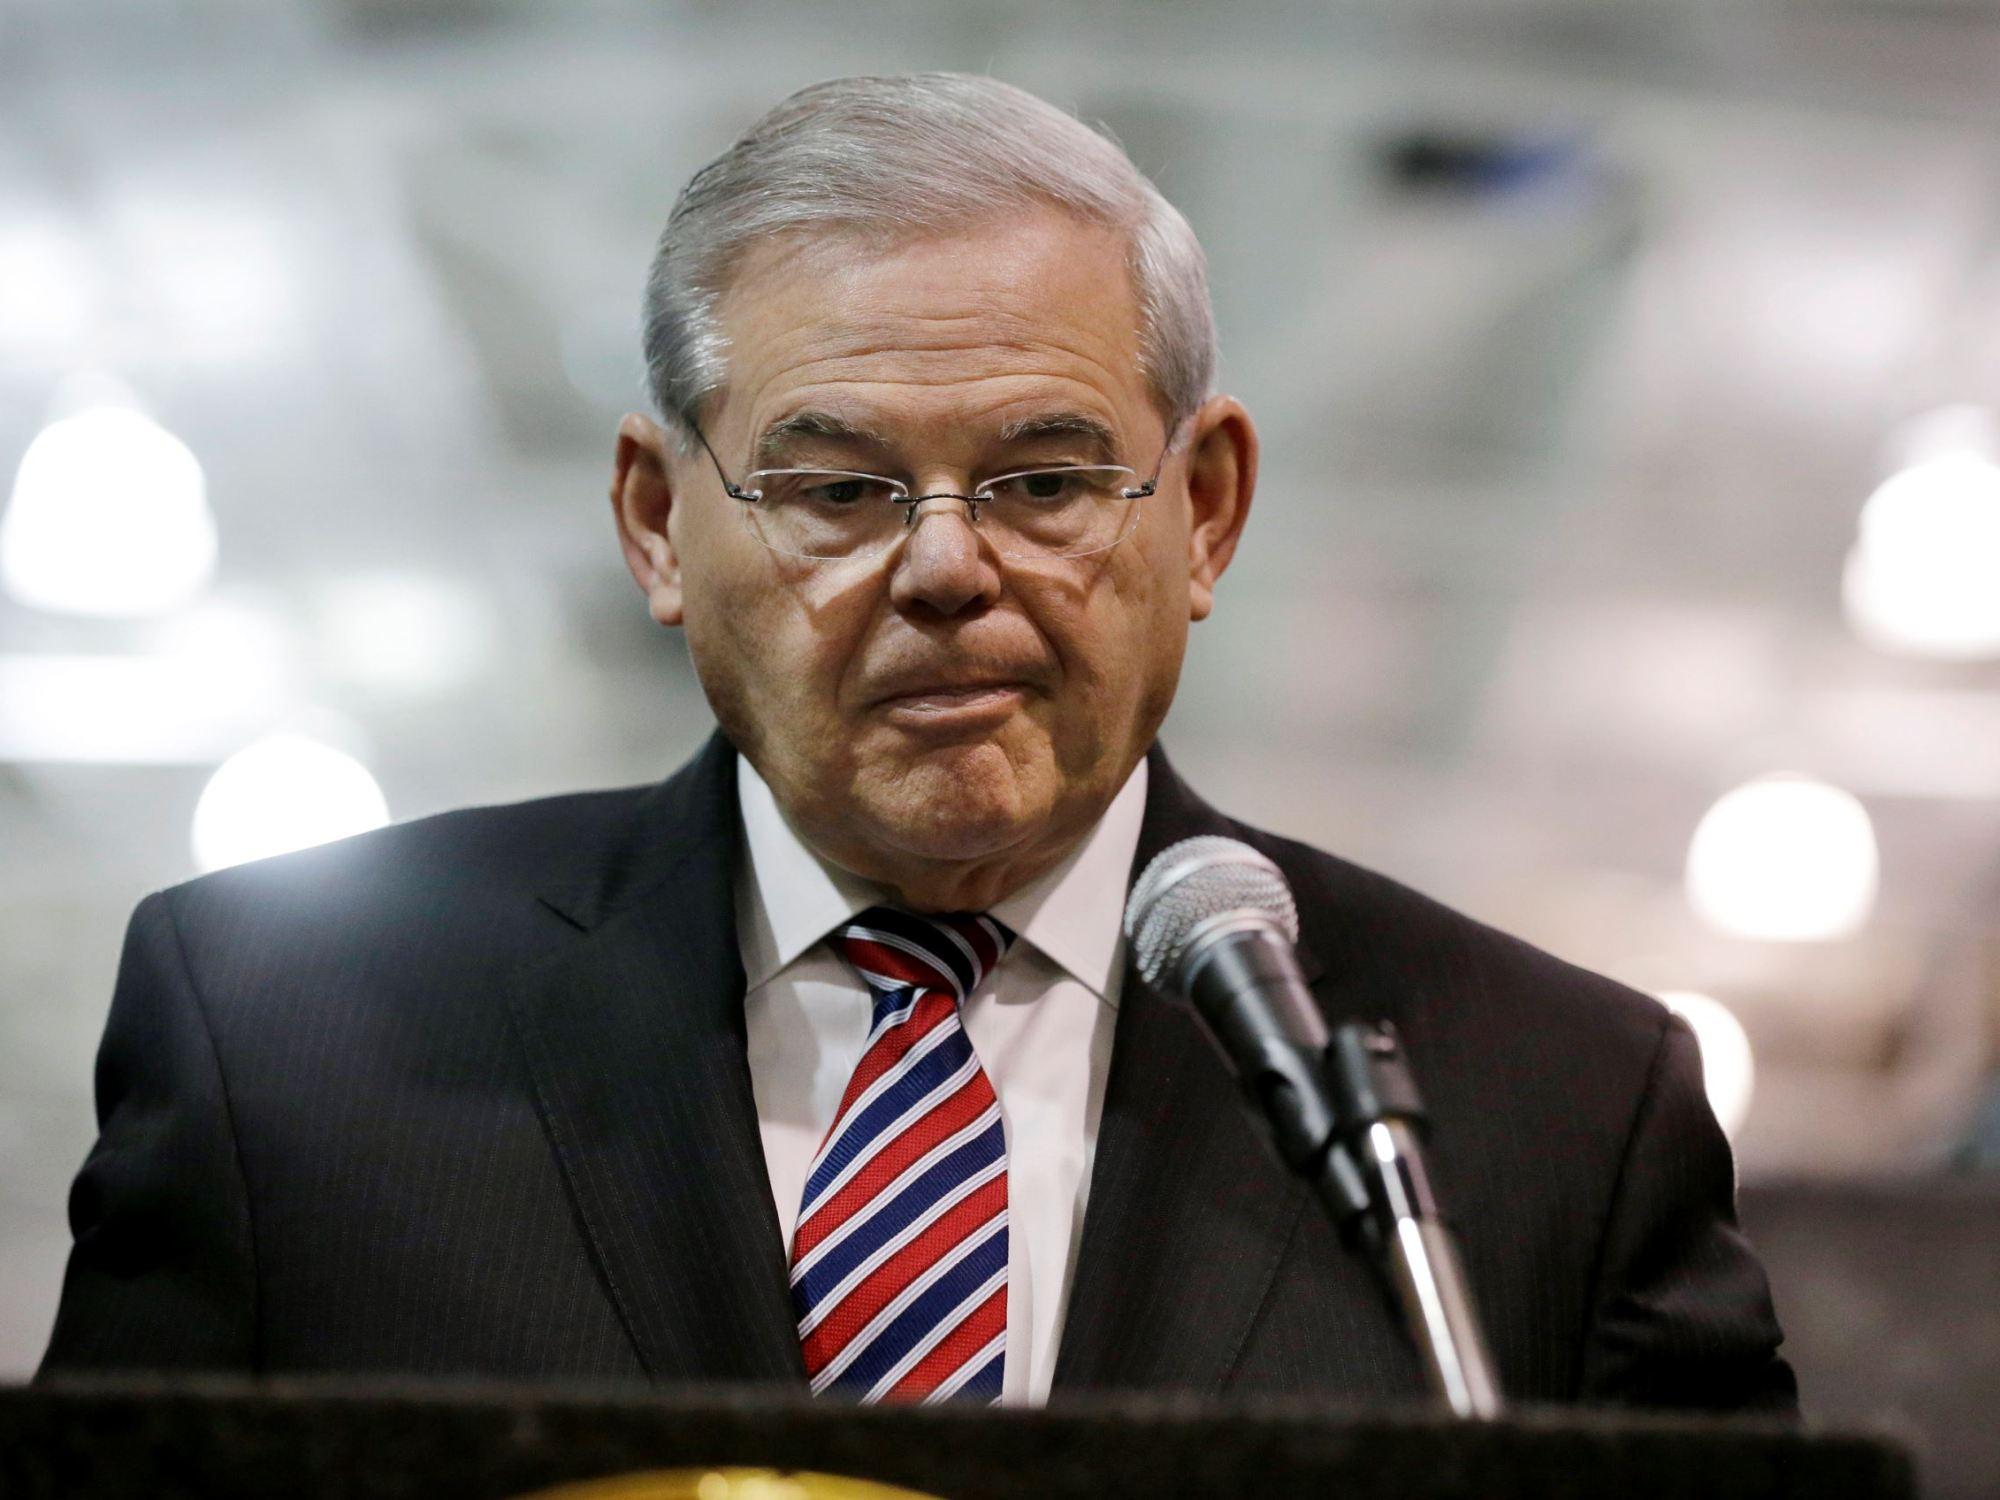 Sen-Menendez-indicted-for-corruption